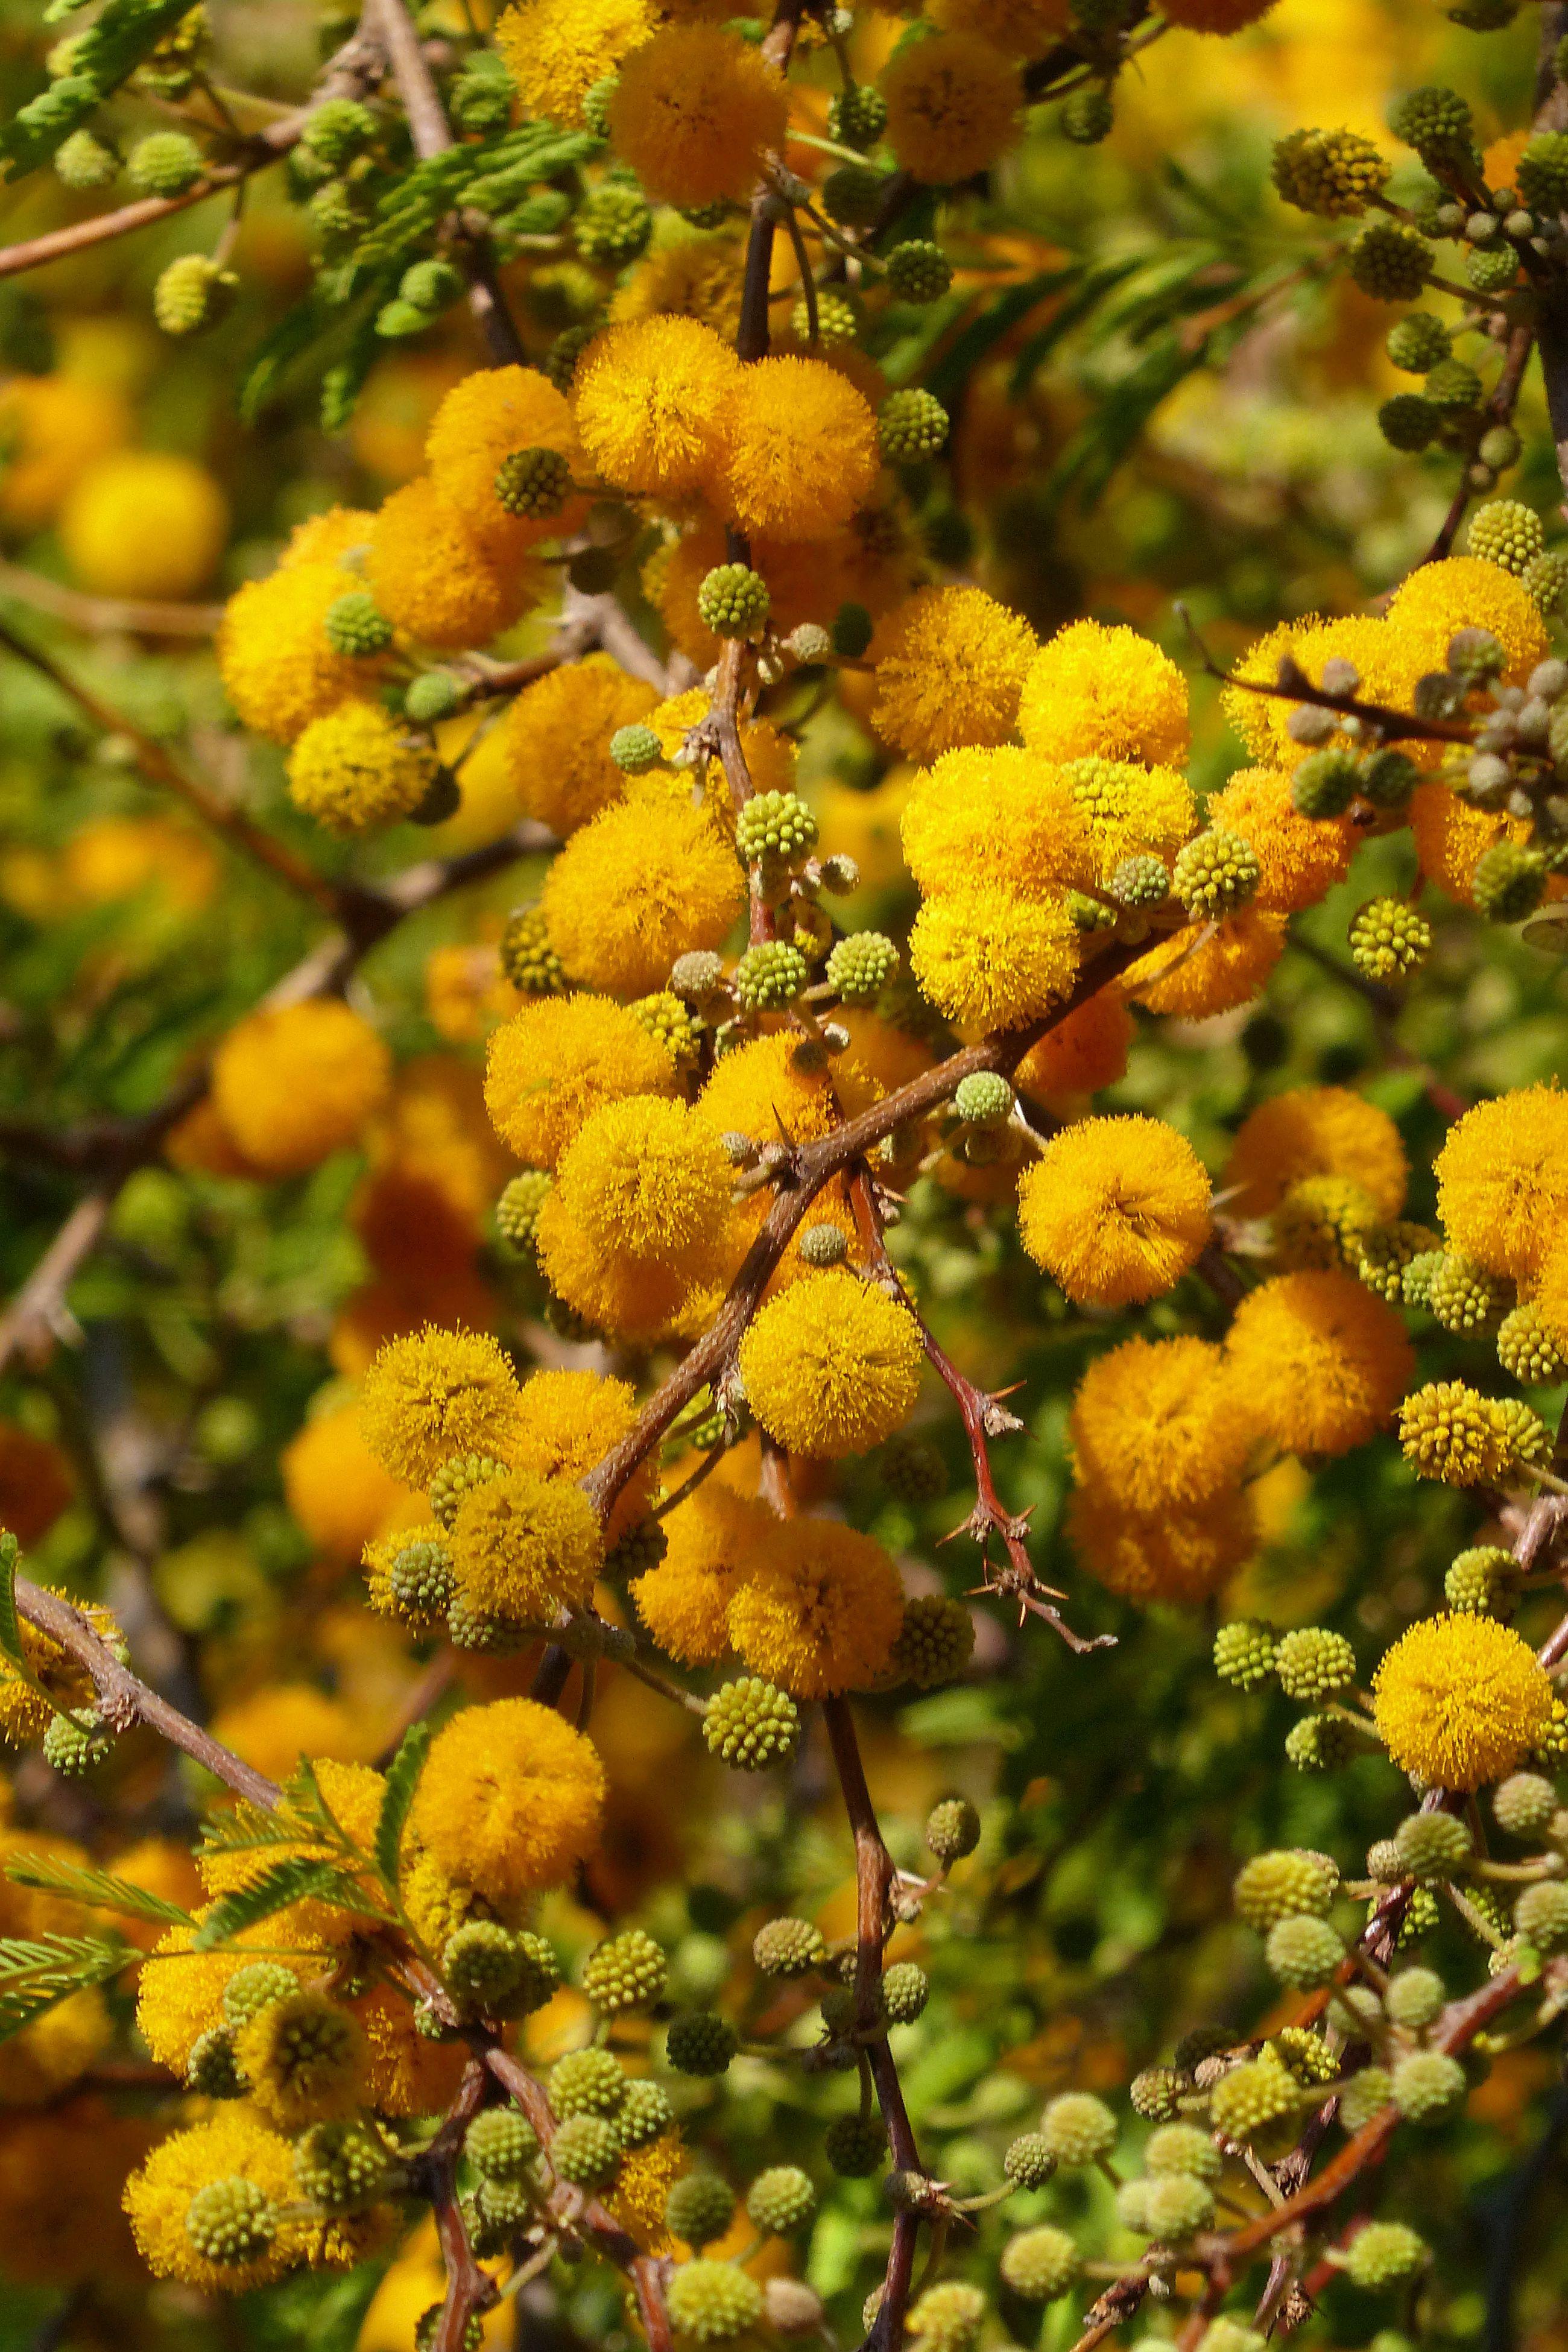 Acacia Farnesiana Or Sweet Acacia Is Just Starting To Bloom In Ottosen Entry Garden Acacia Mimosa Paraguay